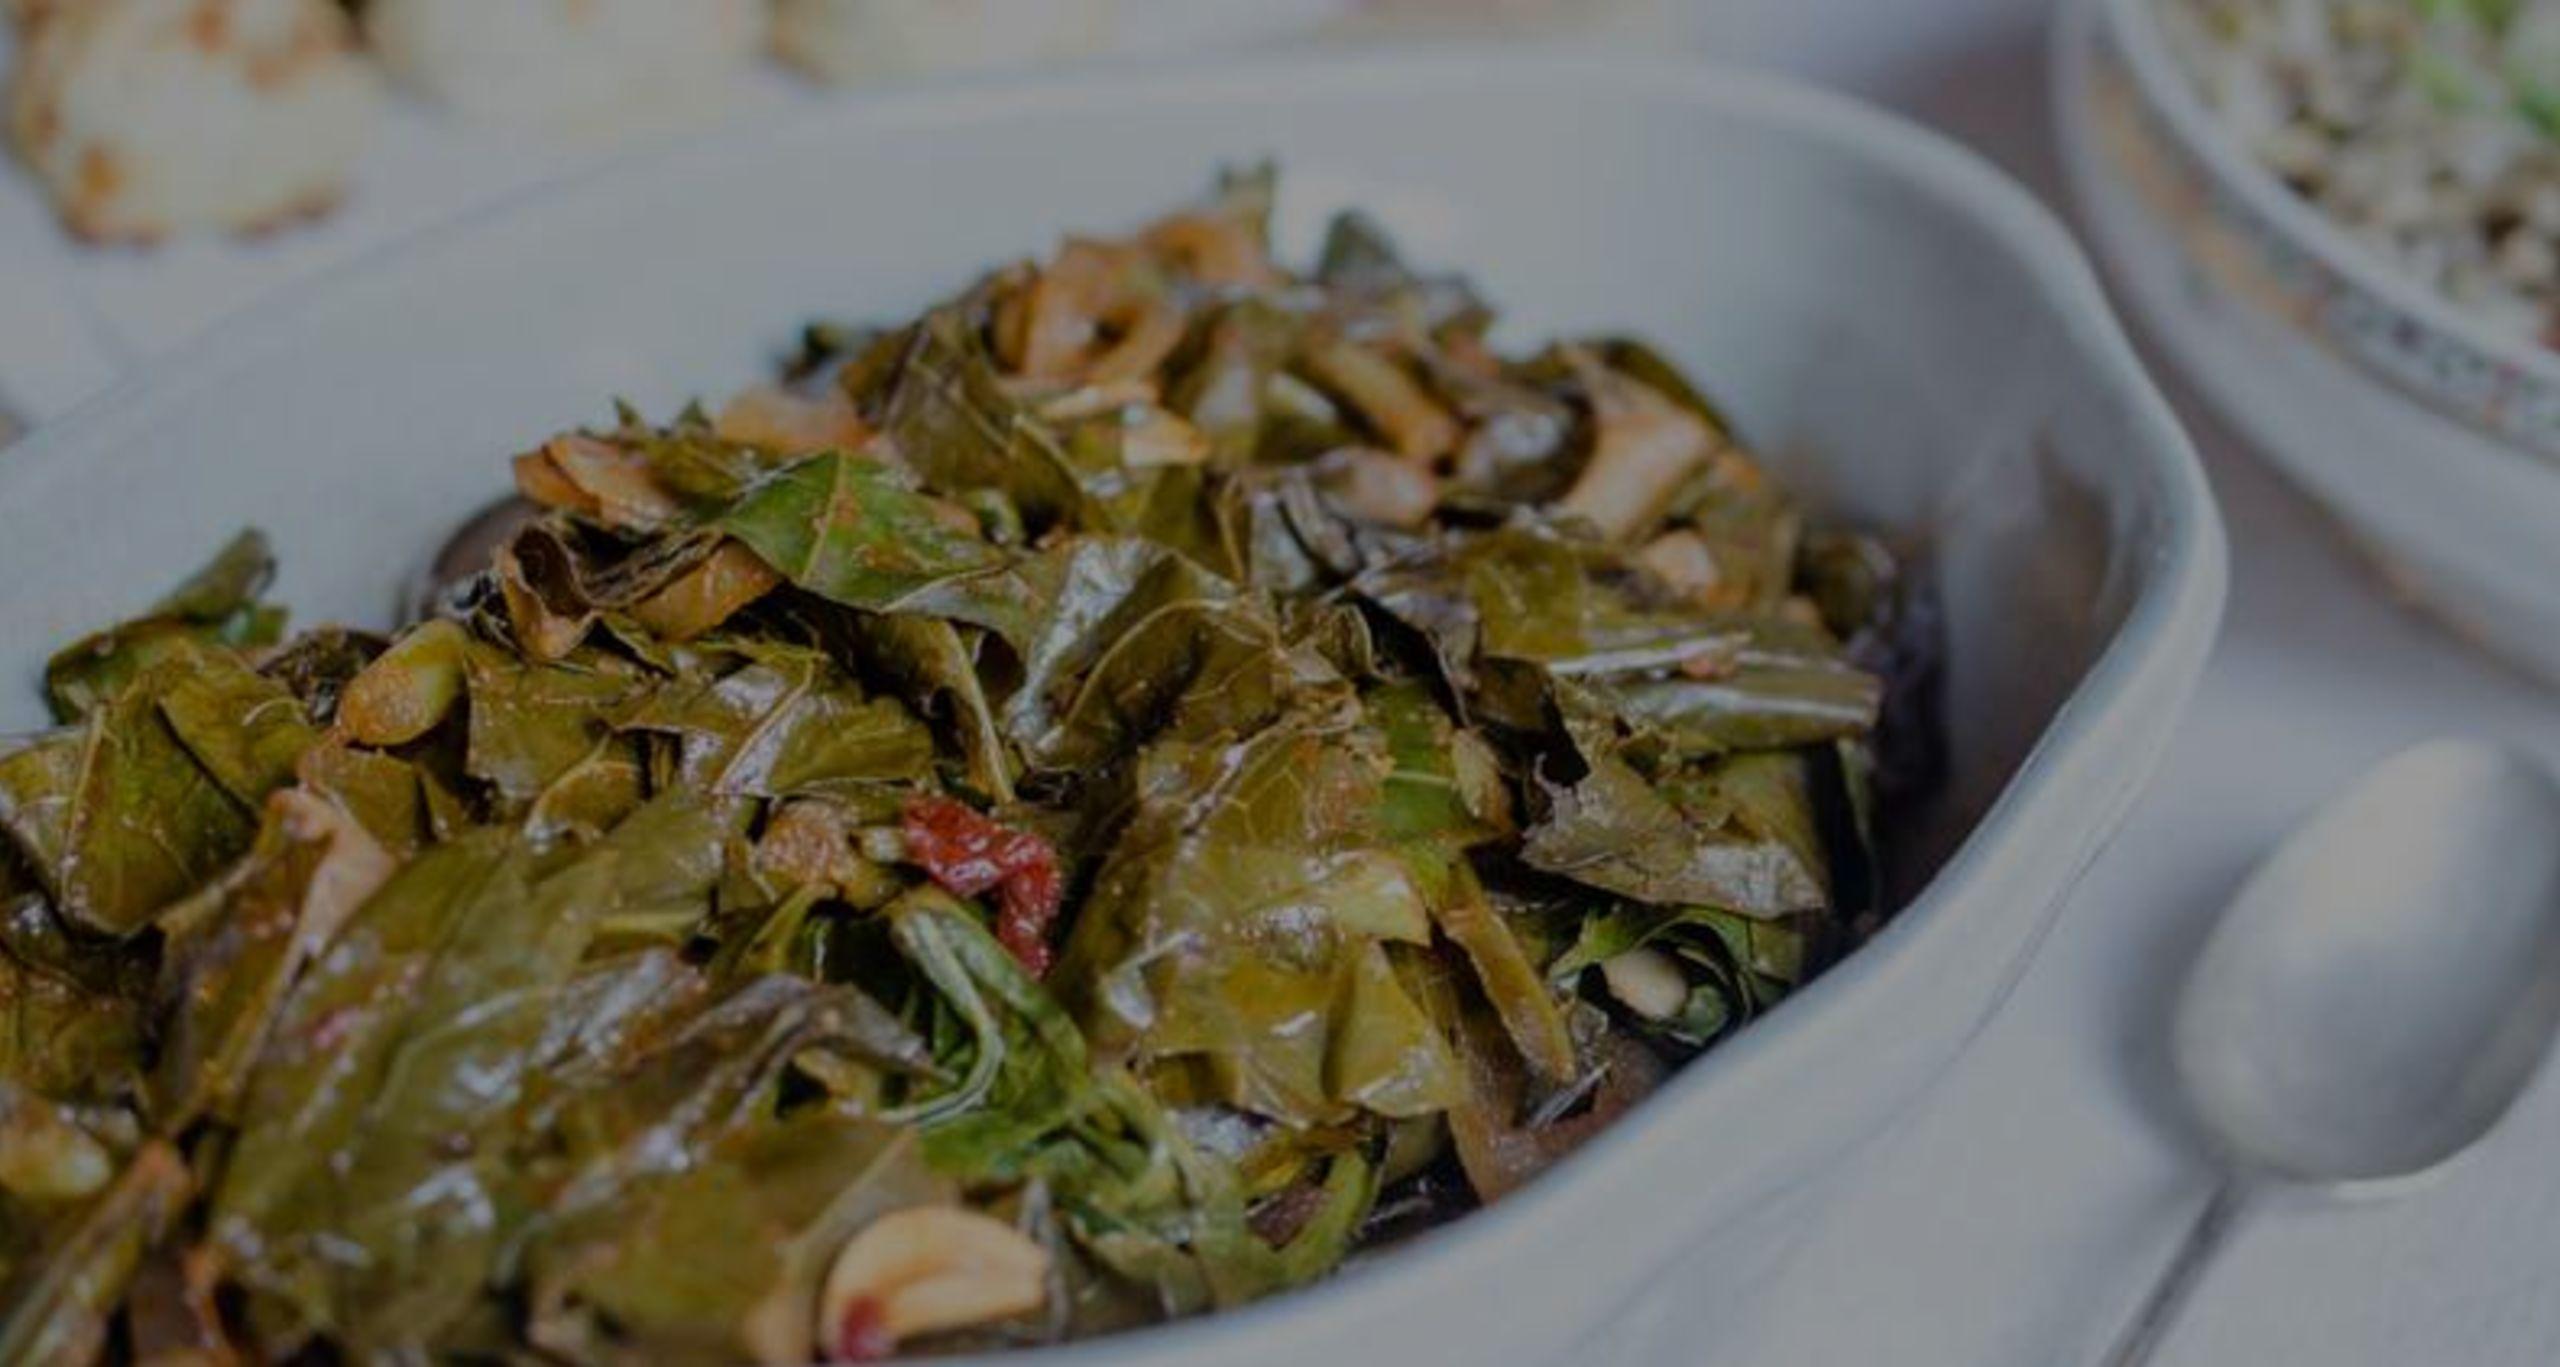 Recipe – Virginia Willis' Smoky Vegan Collard Greens